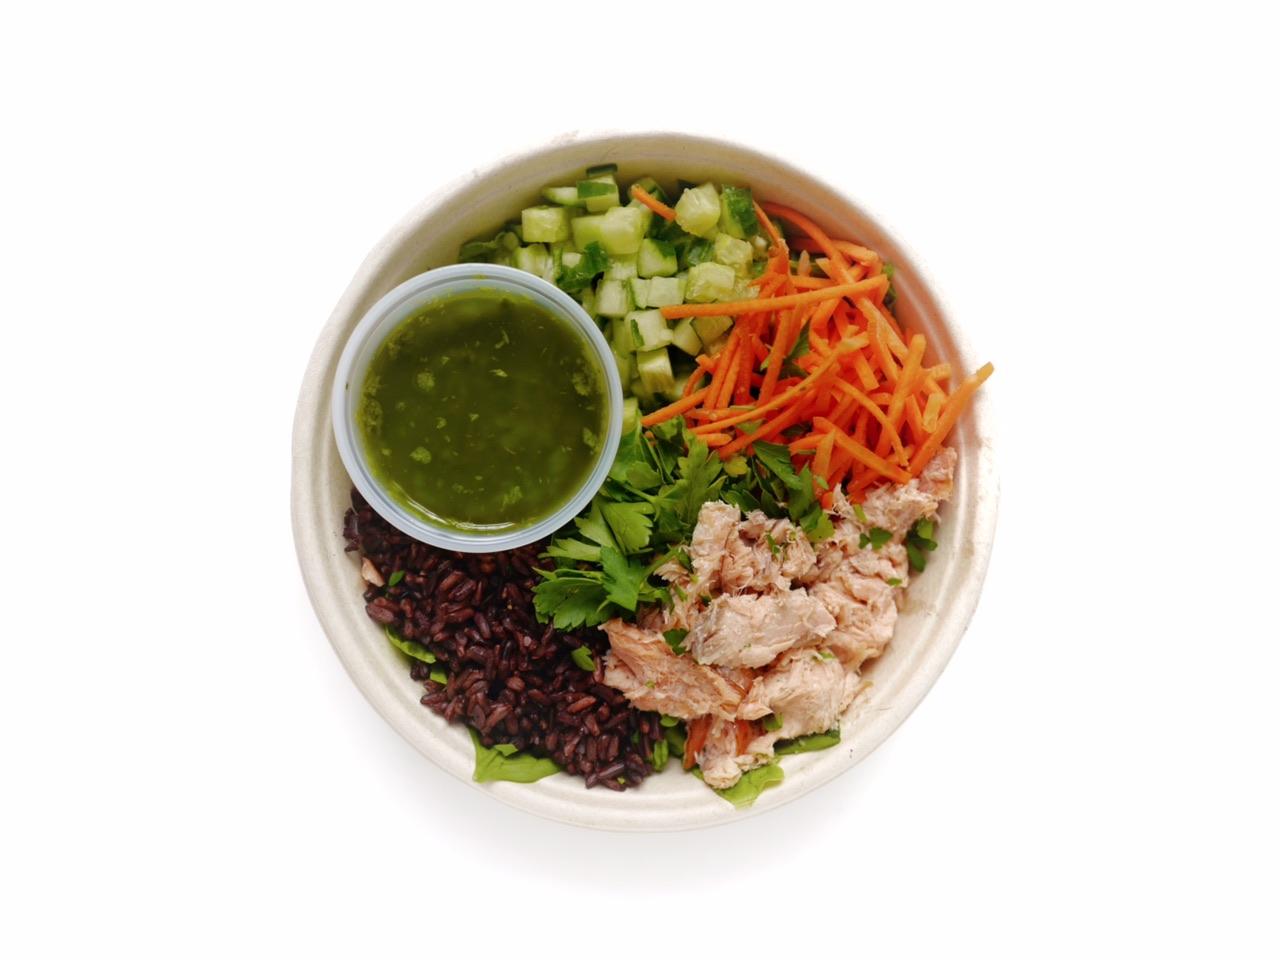 Laxsallad 105:- - Romansallad, grönkål, svart råris, avokado, ingefärspicklad morot, gurka, persilja, frömix, basilikadressing